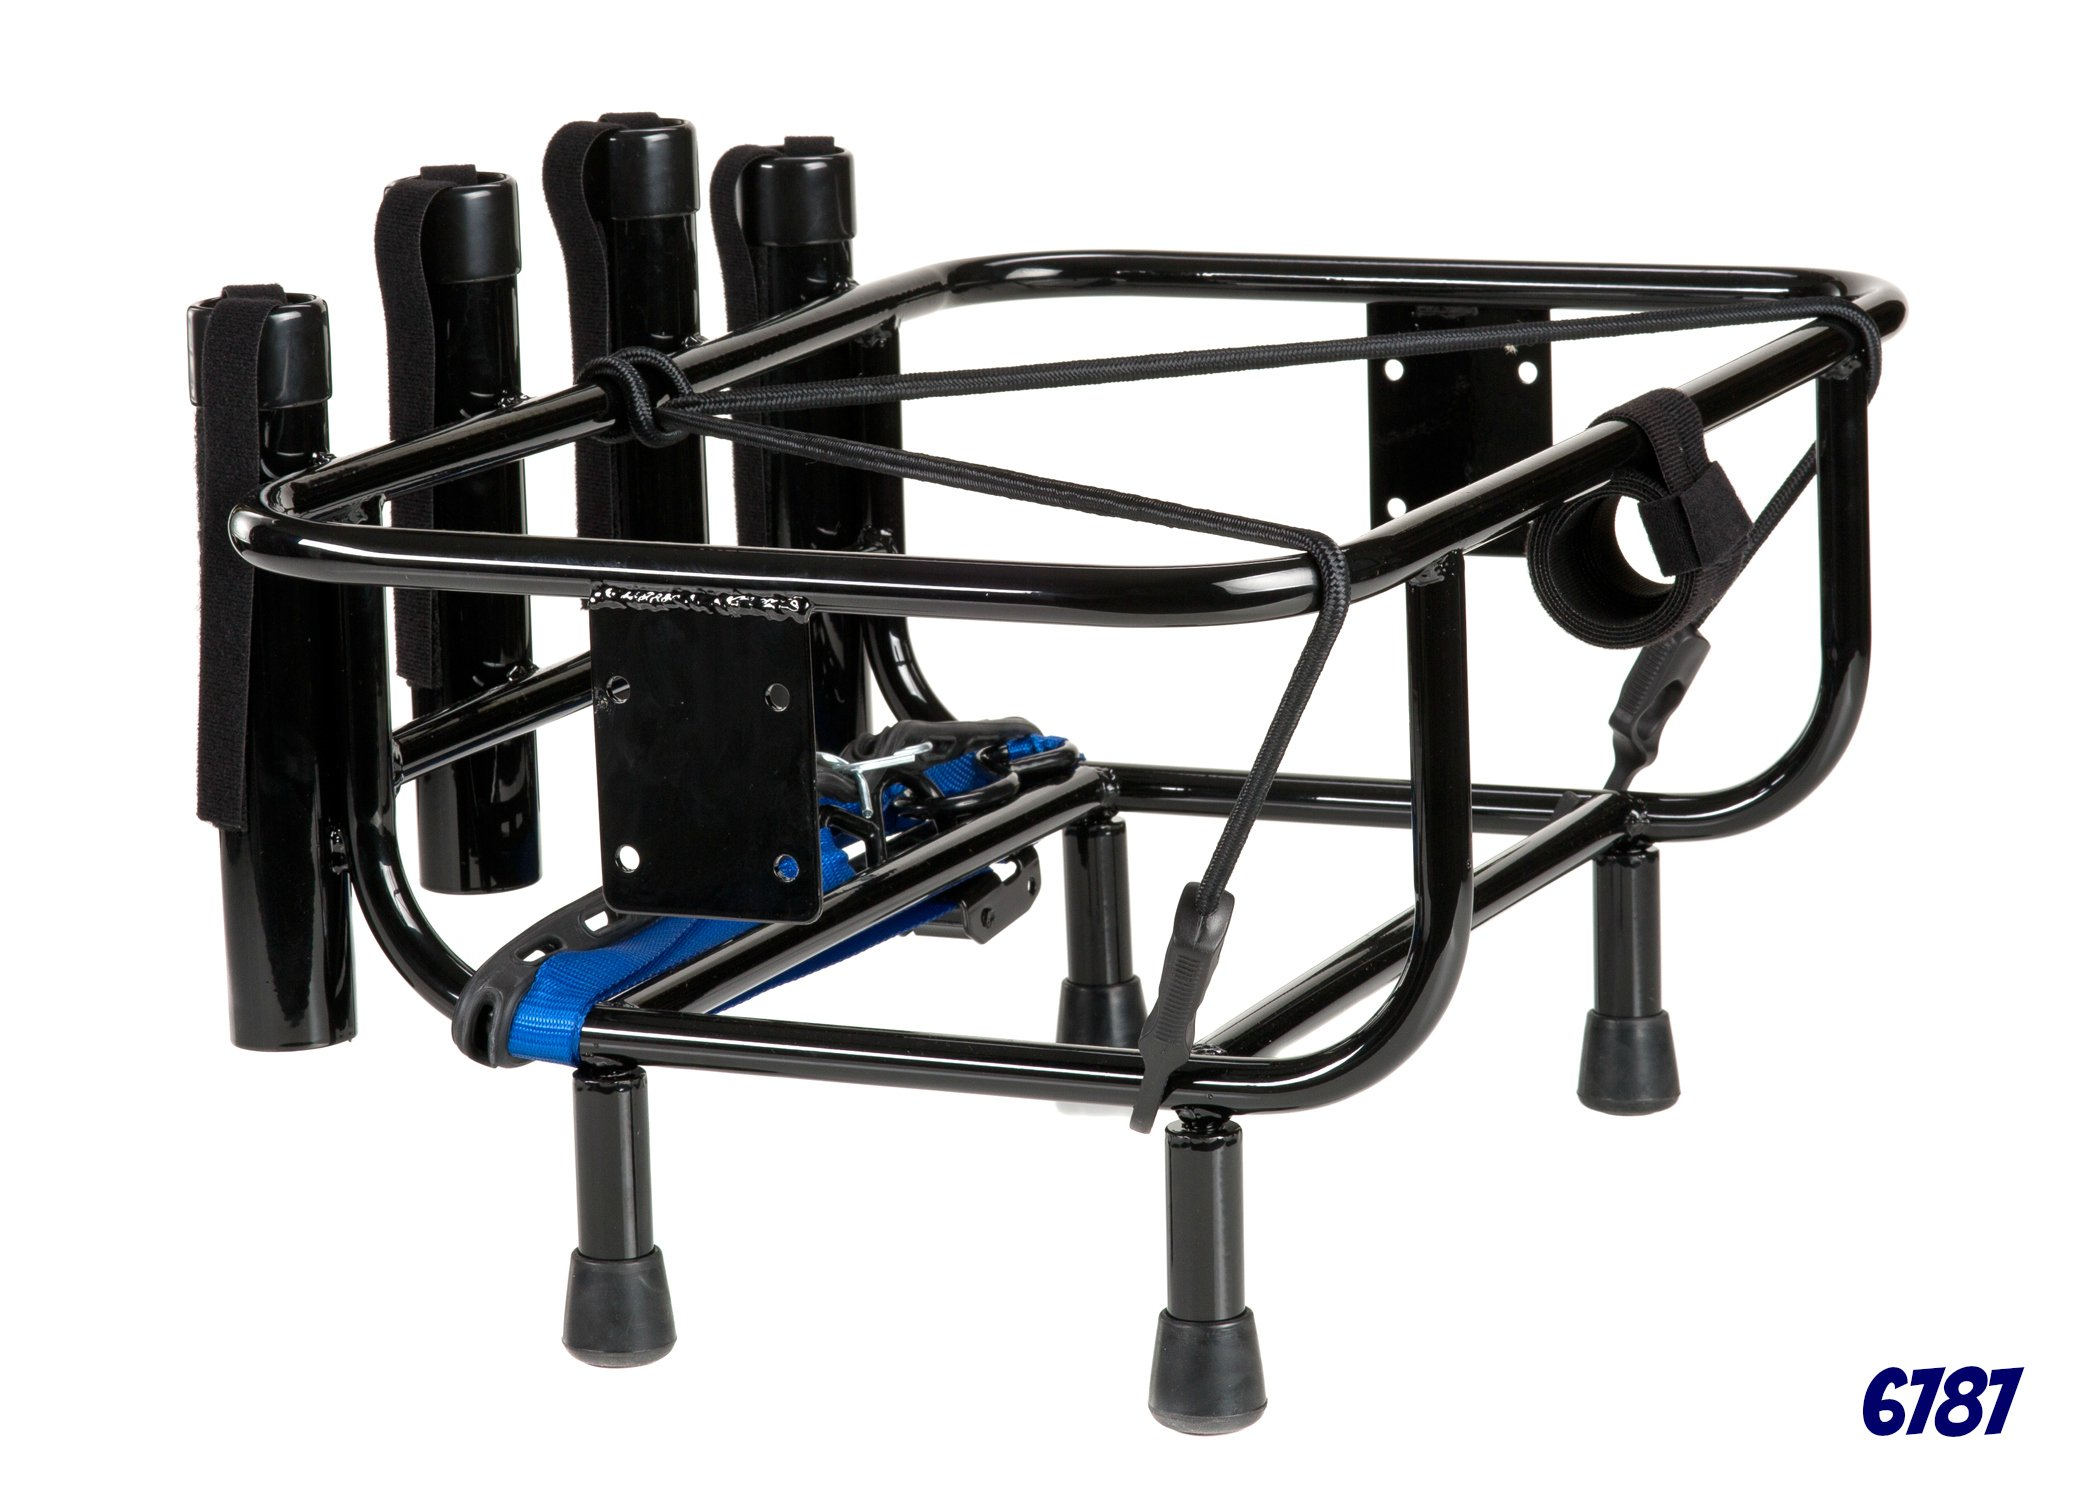 Jetski Fishing Rack with 4 Rod Holders by Kool PWC Stuff